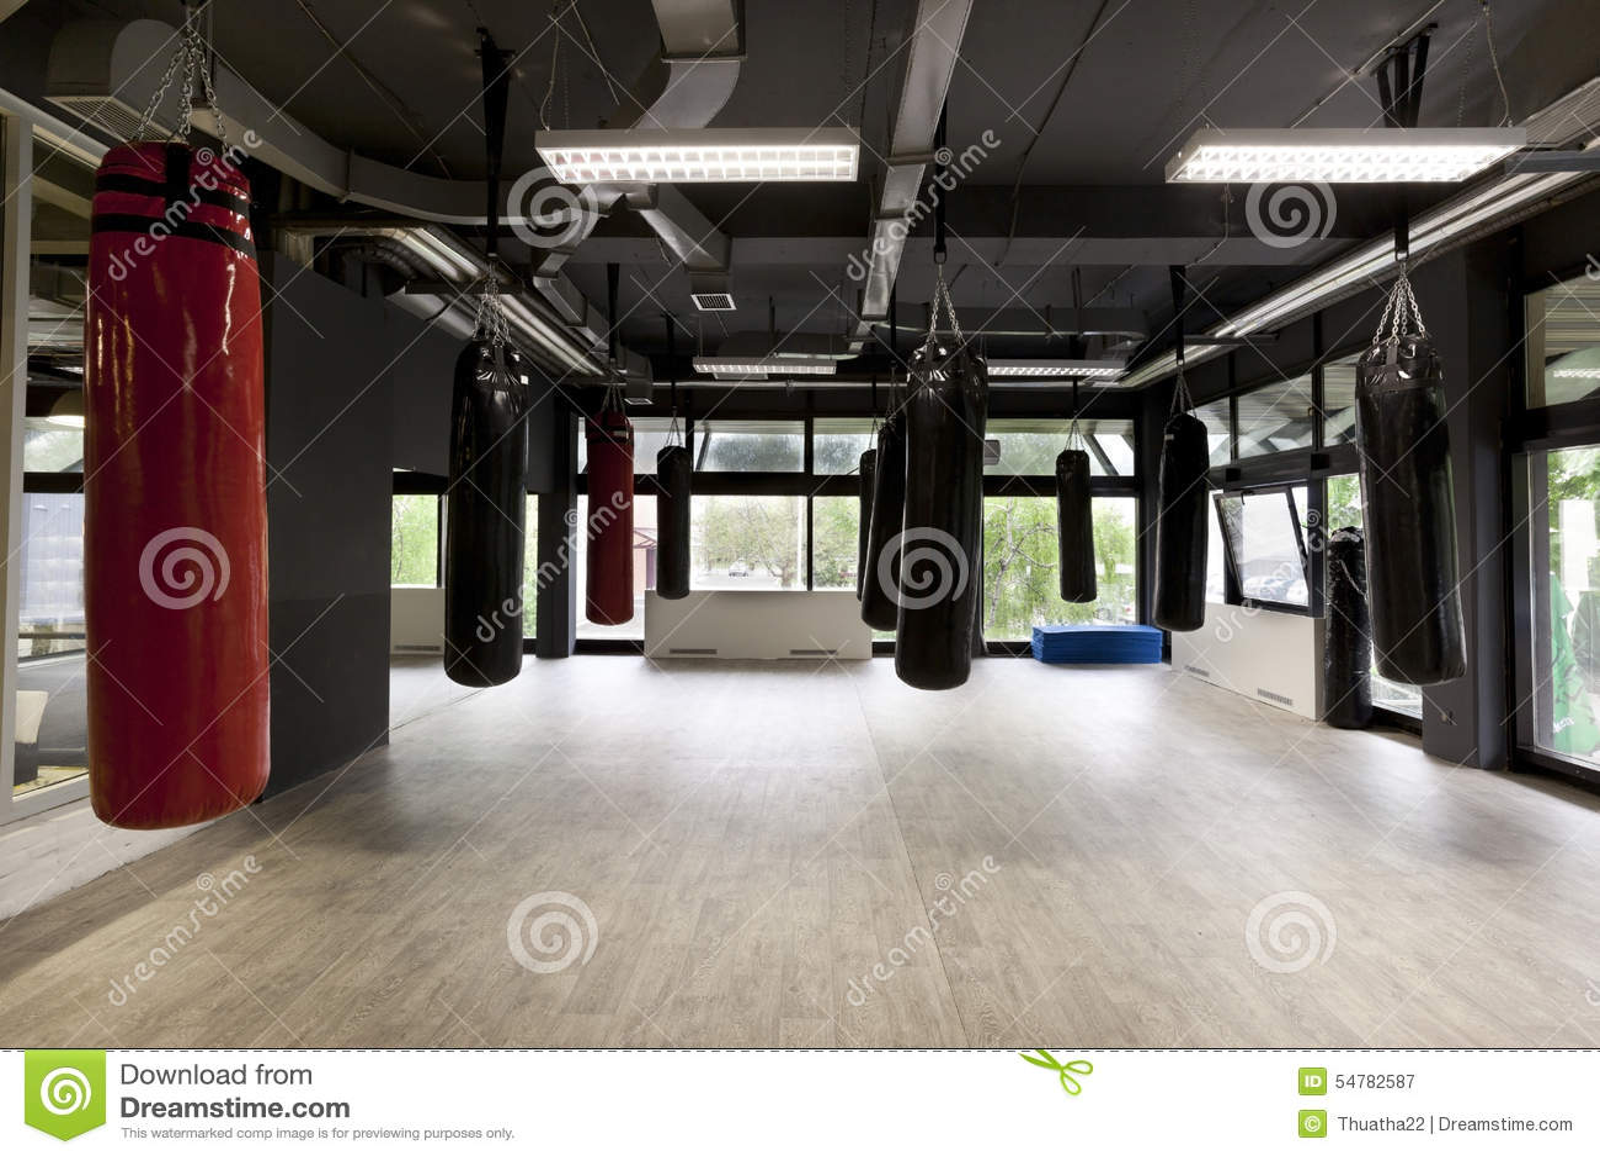 Punching Bags In Modern Gym